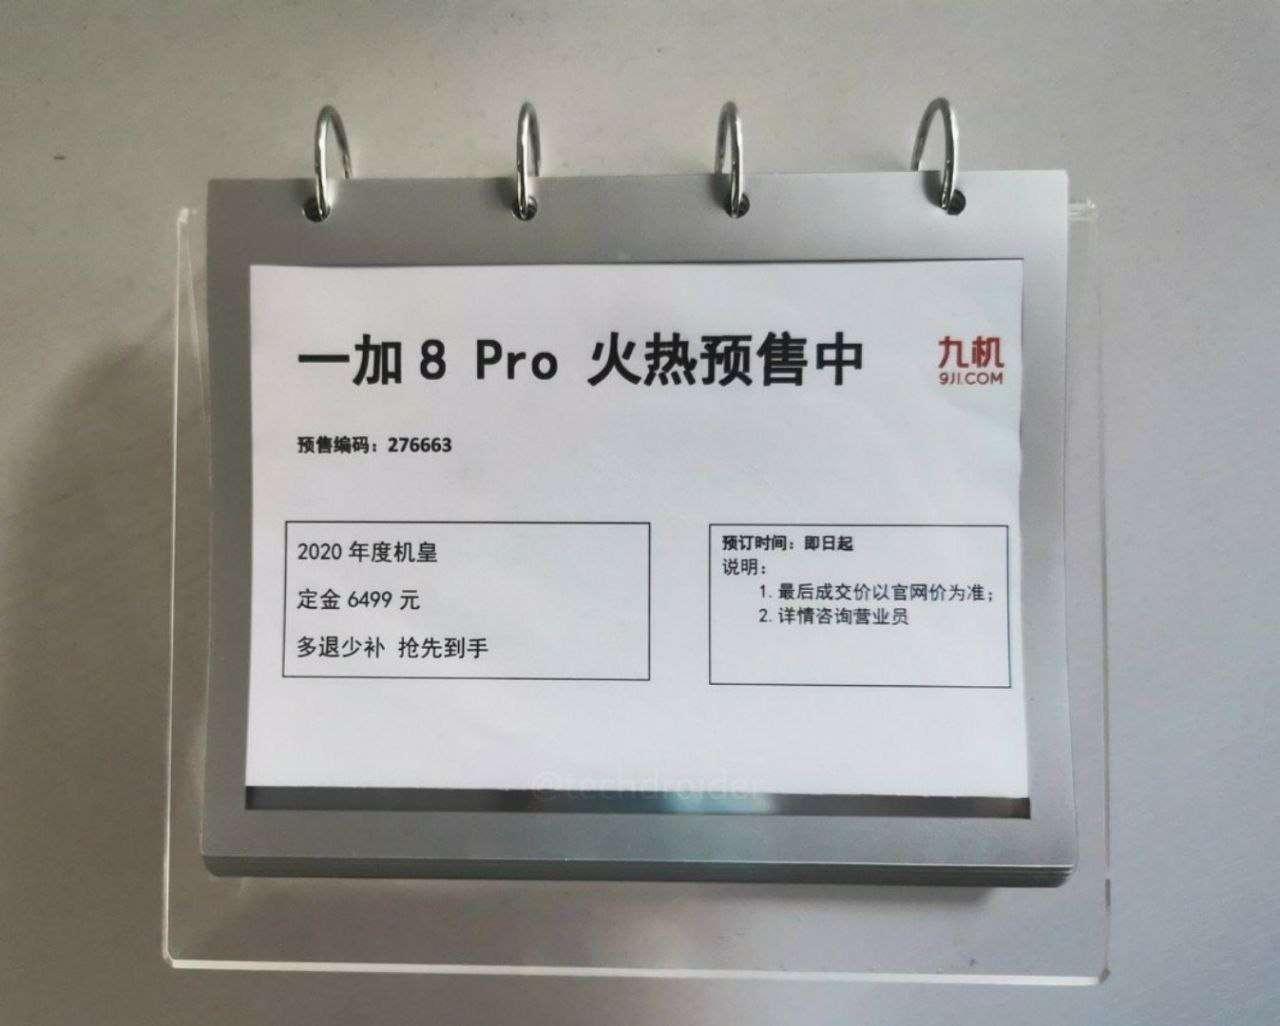 OnePlus 8 Pro Price Leak (Weibo)